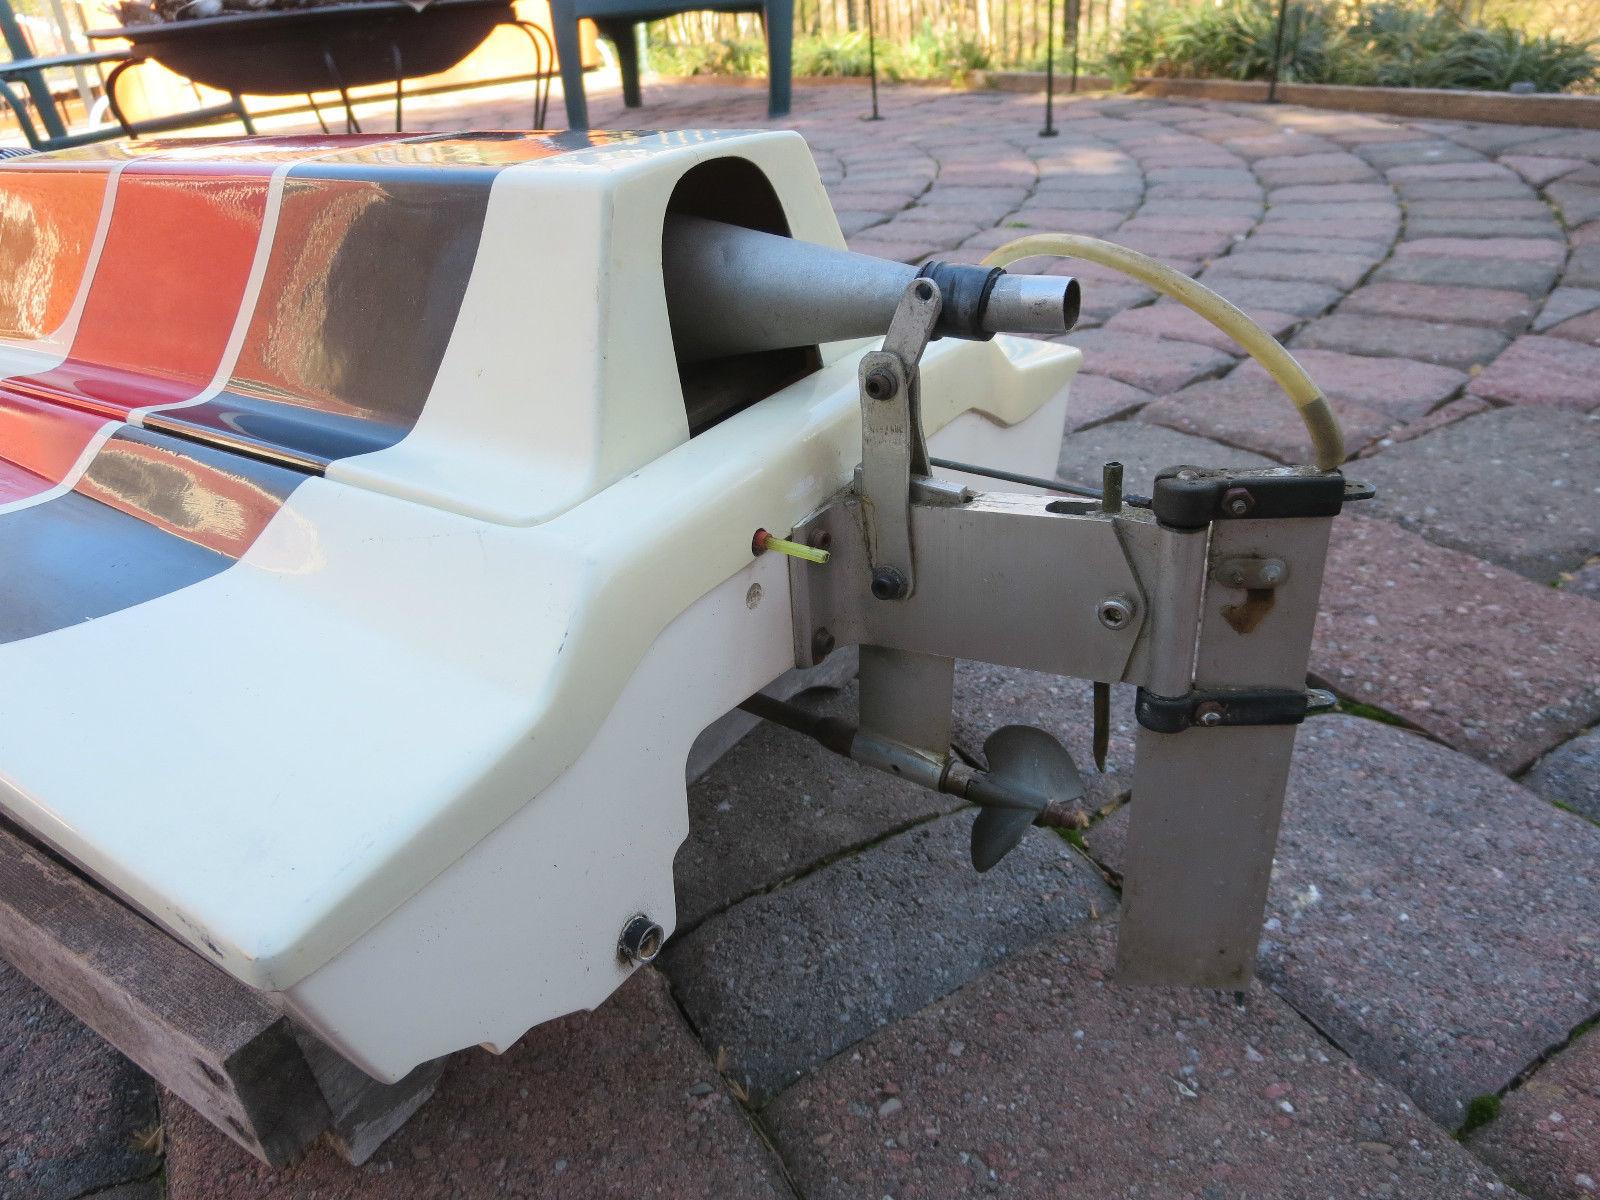 Aeromarine Mean Machine   what year?? - RCU Forums